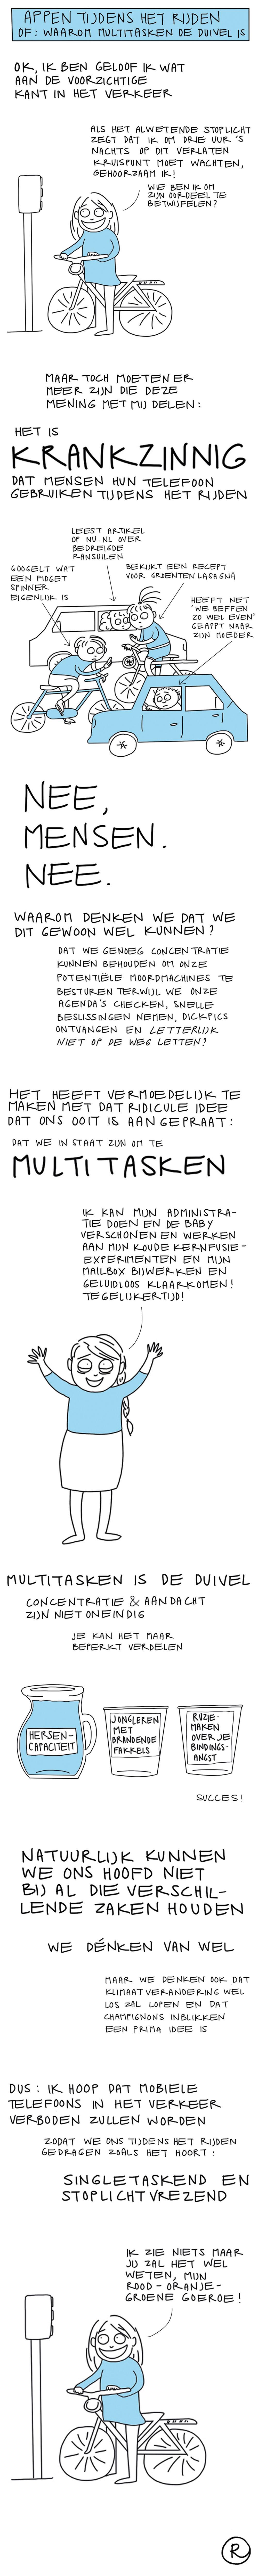 multitasken online.jpg